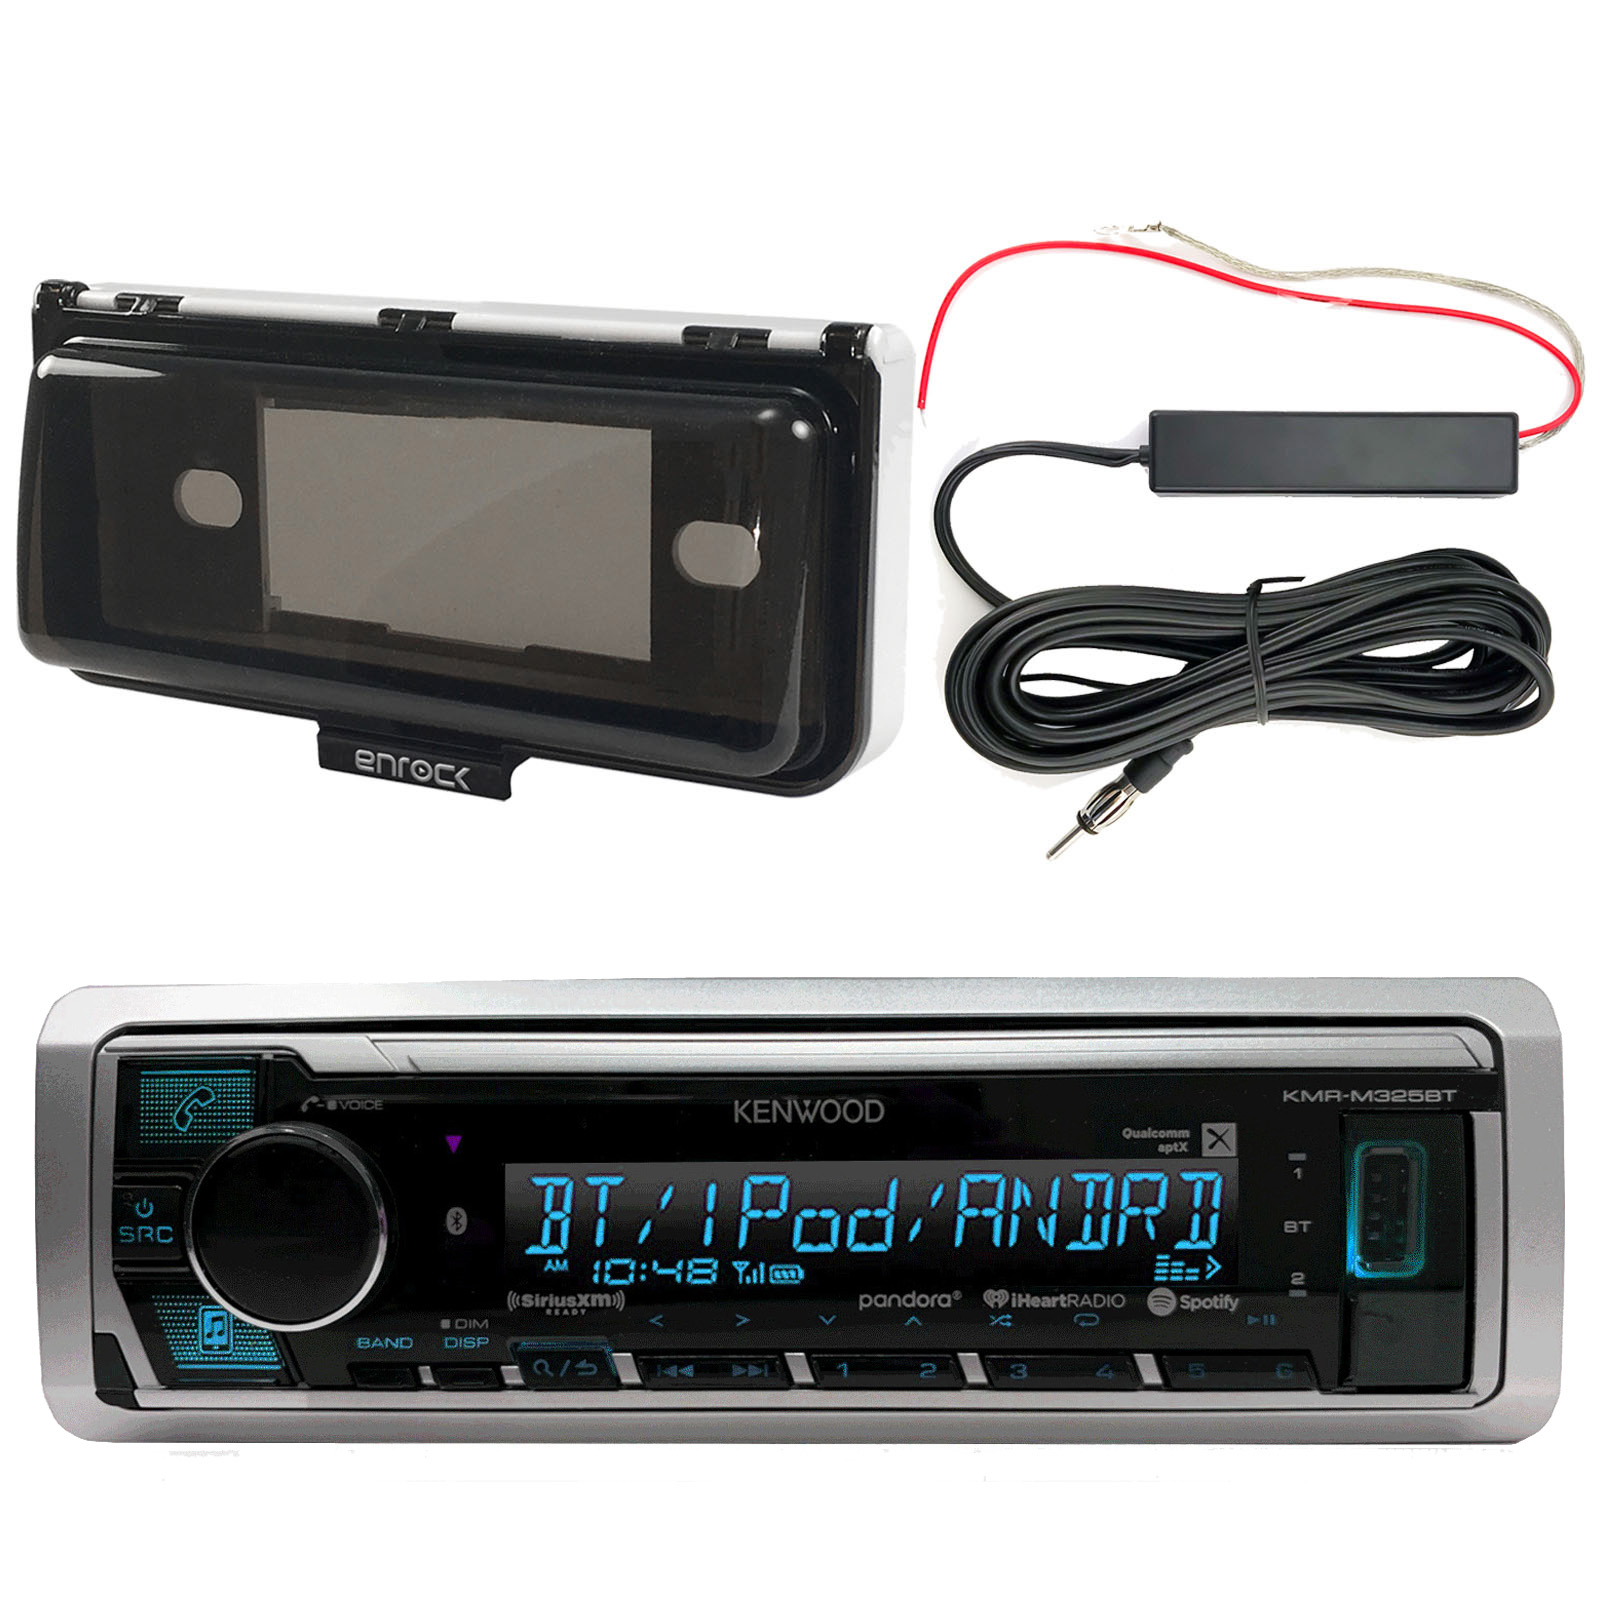 Kenwood KMRM325BT Marine Bluetooth Receiver, Marine Radio Cover - White, Enrock 12 Volt Amp Booster Kit